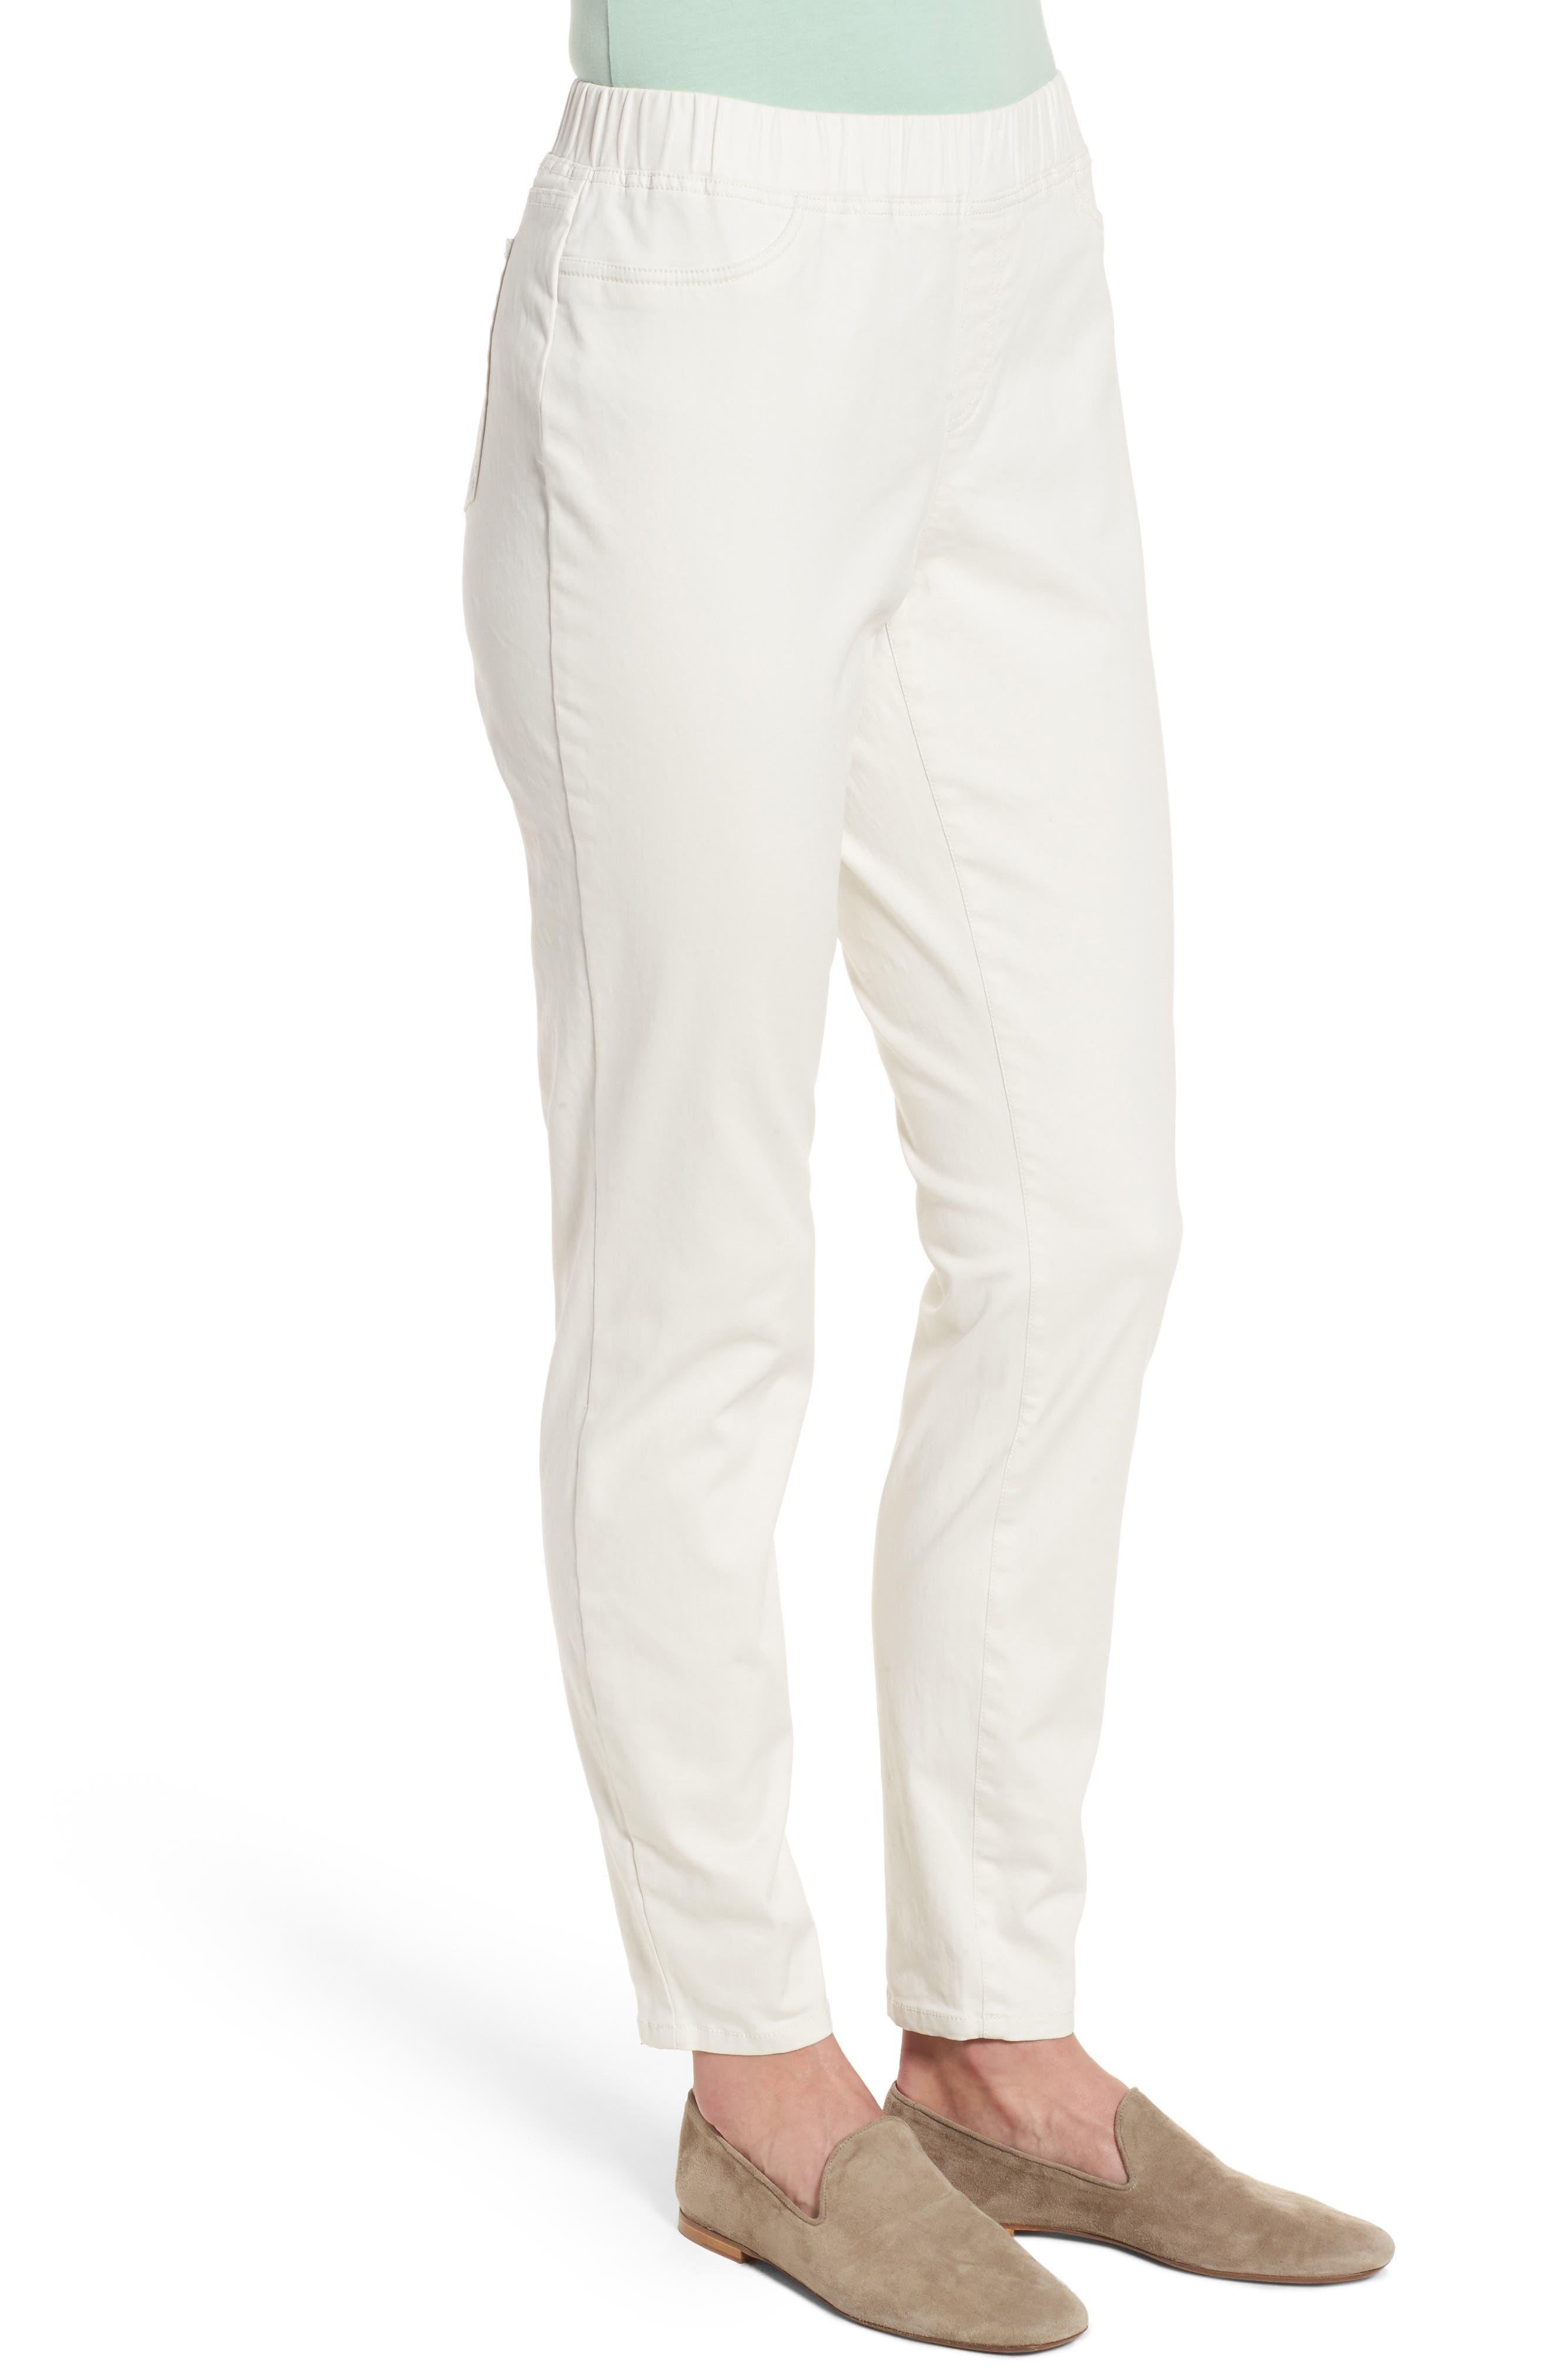 Stretch Organic Cotton Denim Skinny Pants,                             Alternate thumbnail 3, color,                             Bone